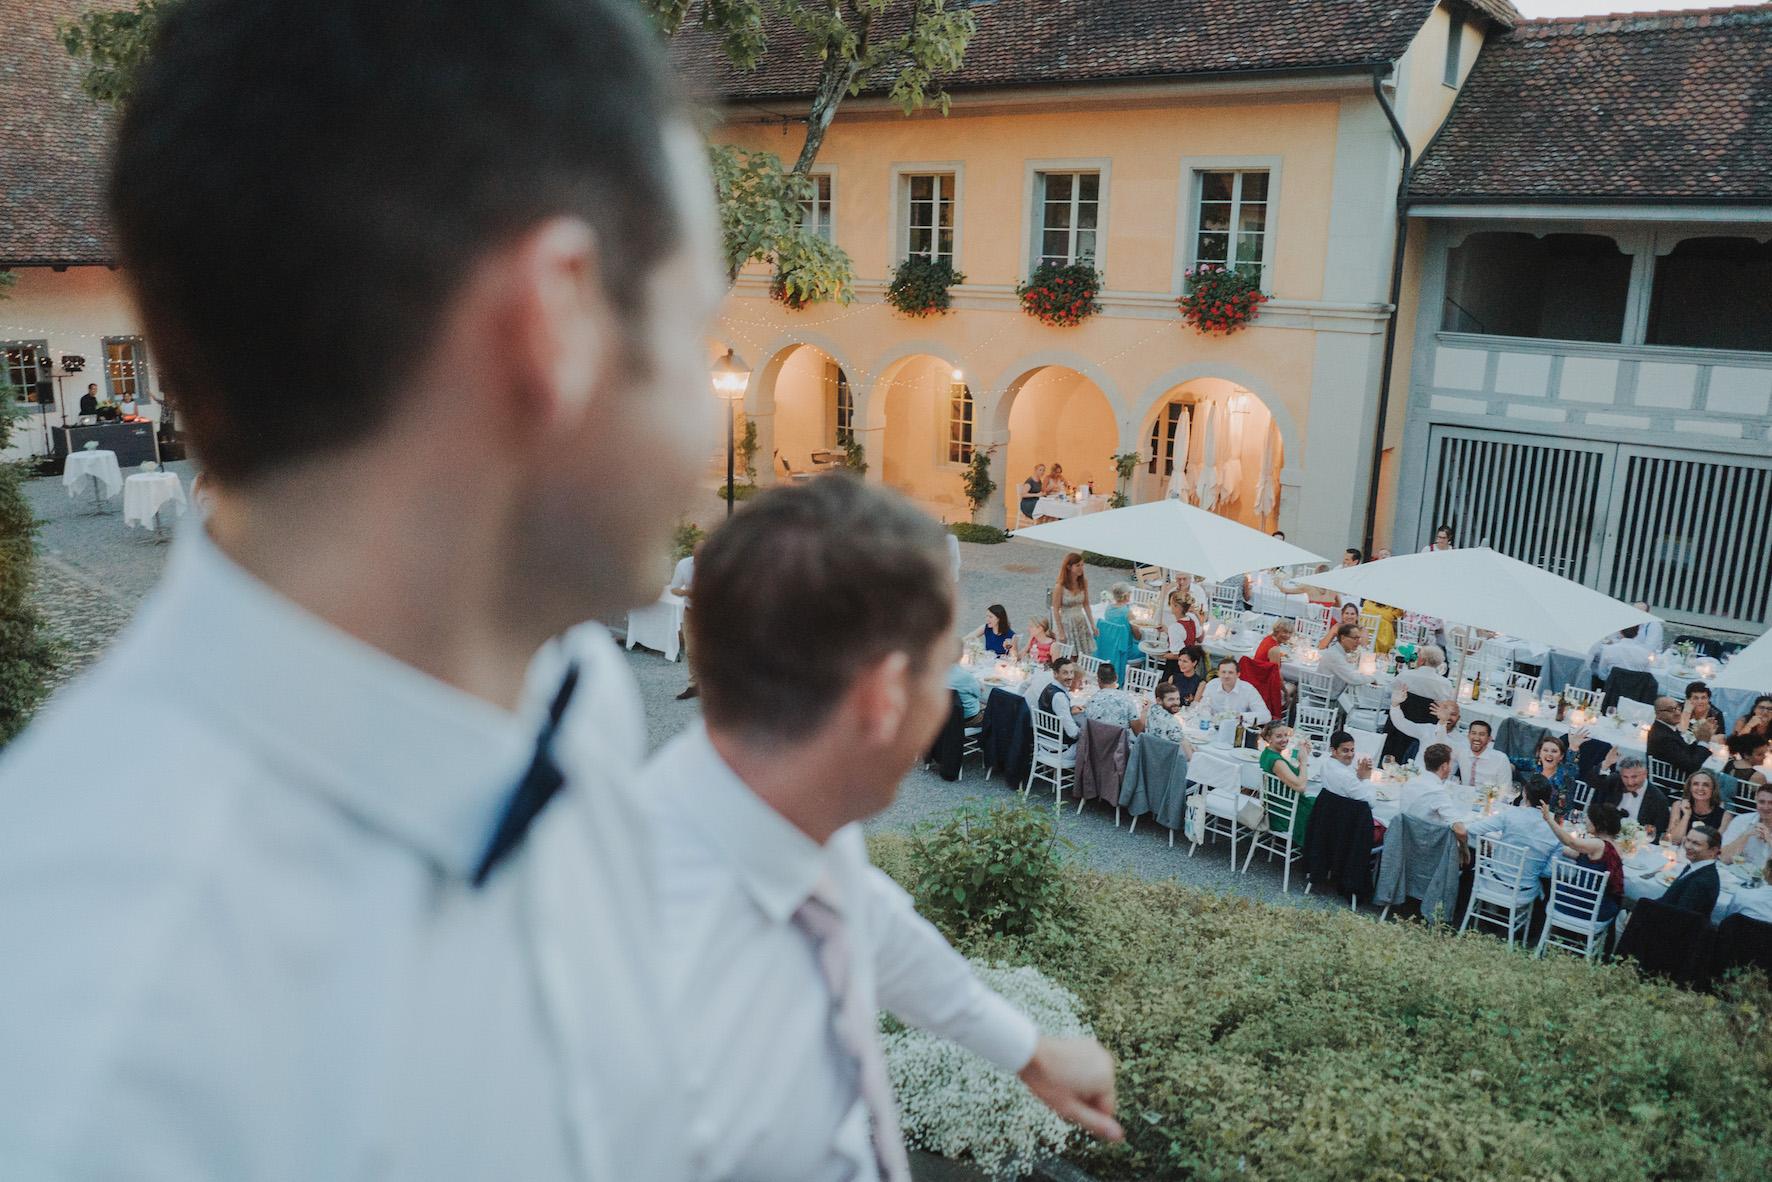 201807270008JC_wedding-0553220180824-Kopie.jpg